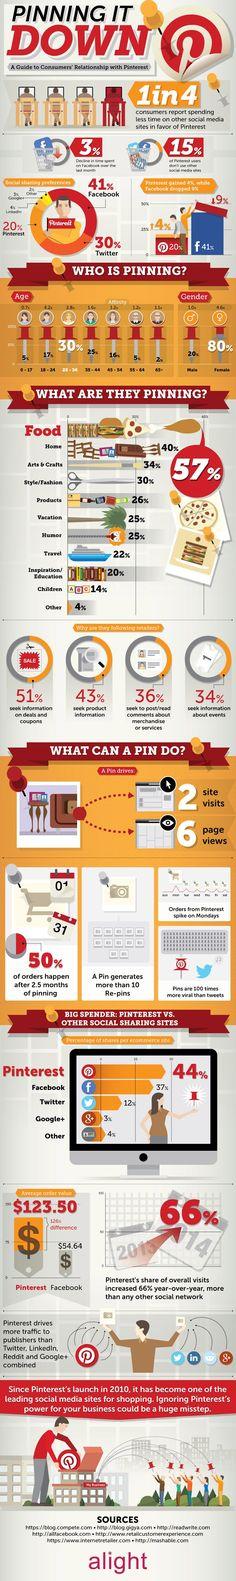 La incorporación de #Pinterest en tu estrategia de Marketing #infografia #infographic #marketing